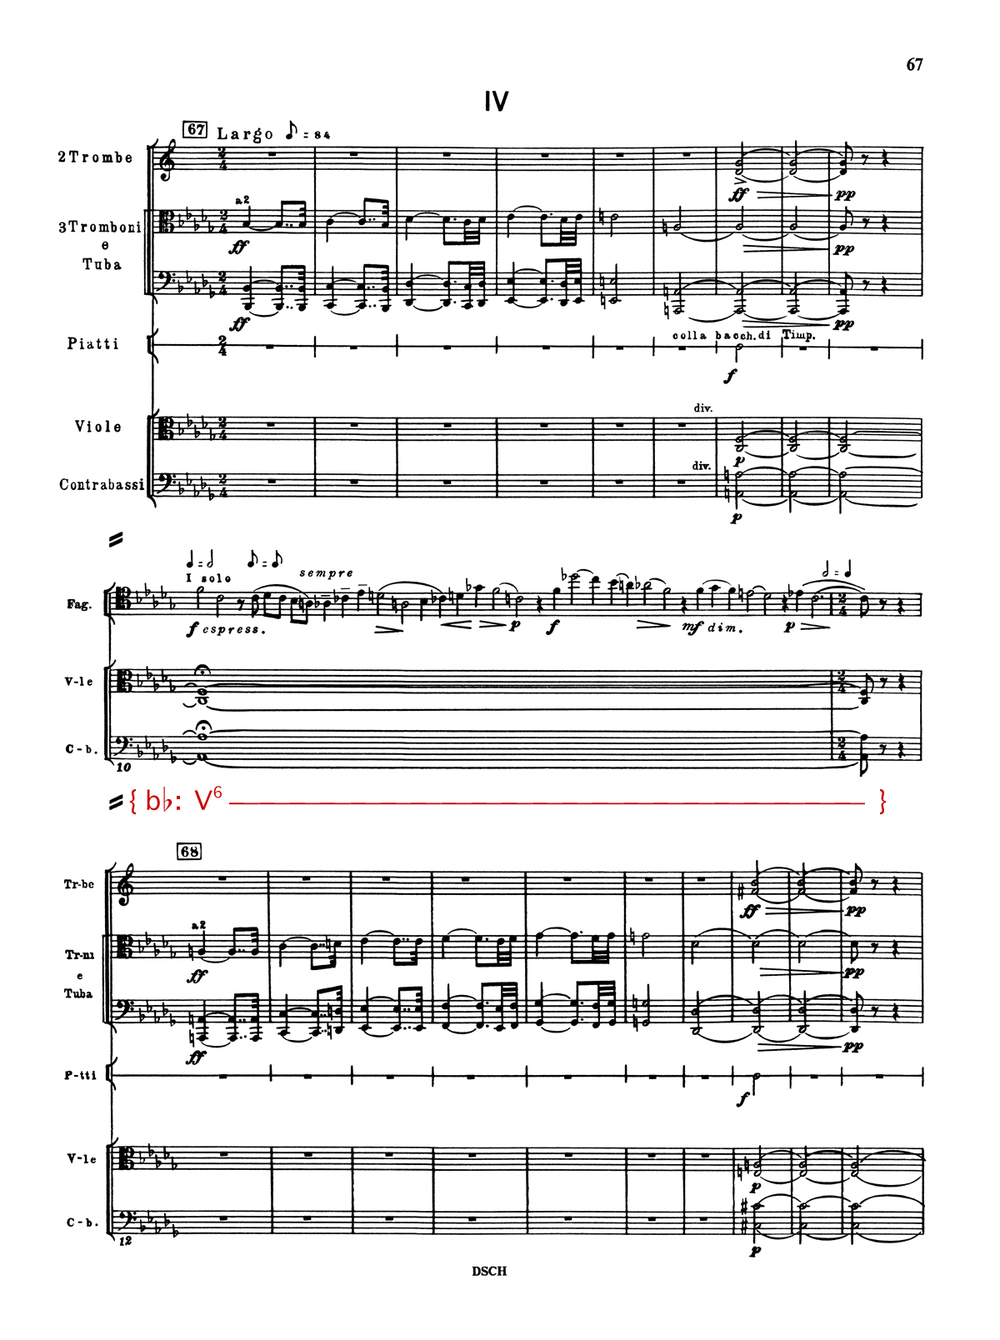 Shostakovich 9 theory_1.jpg